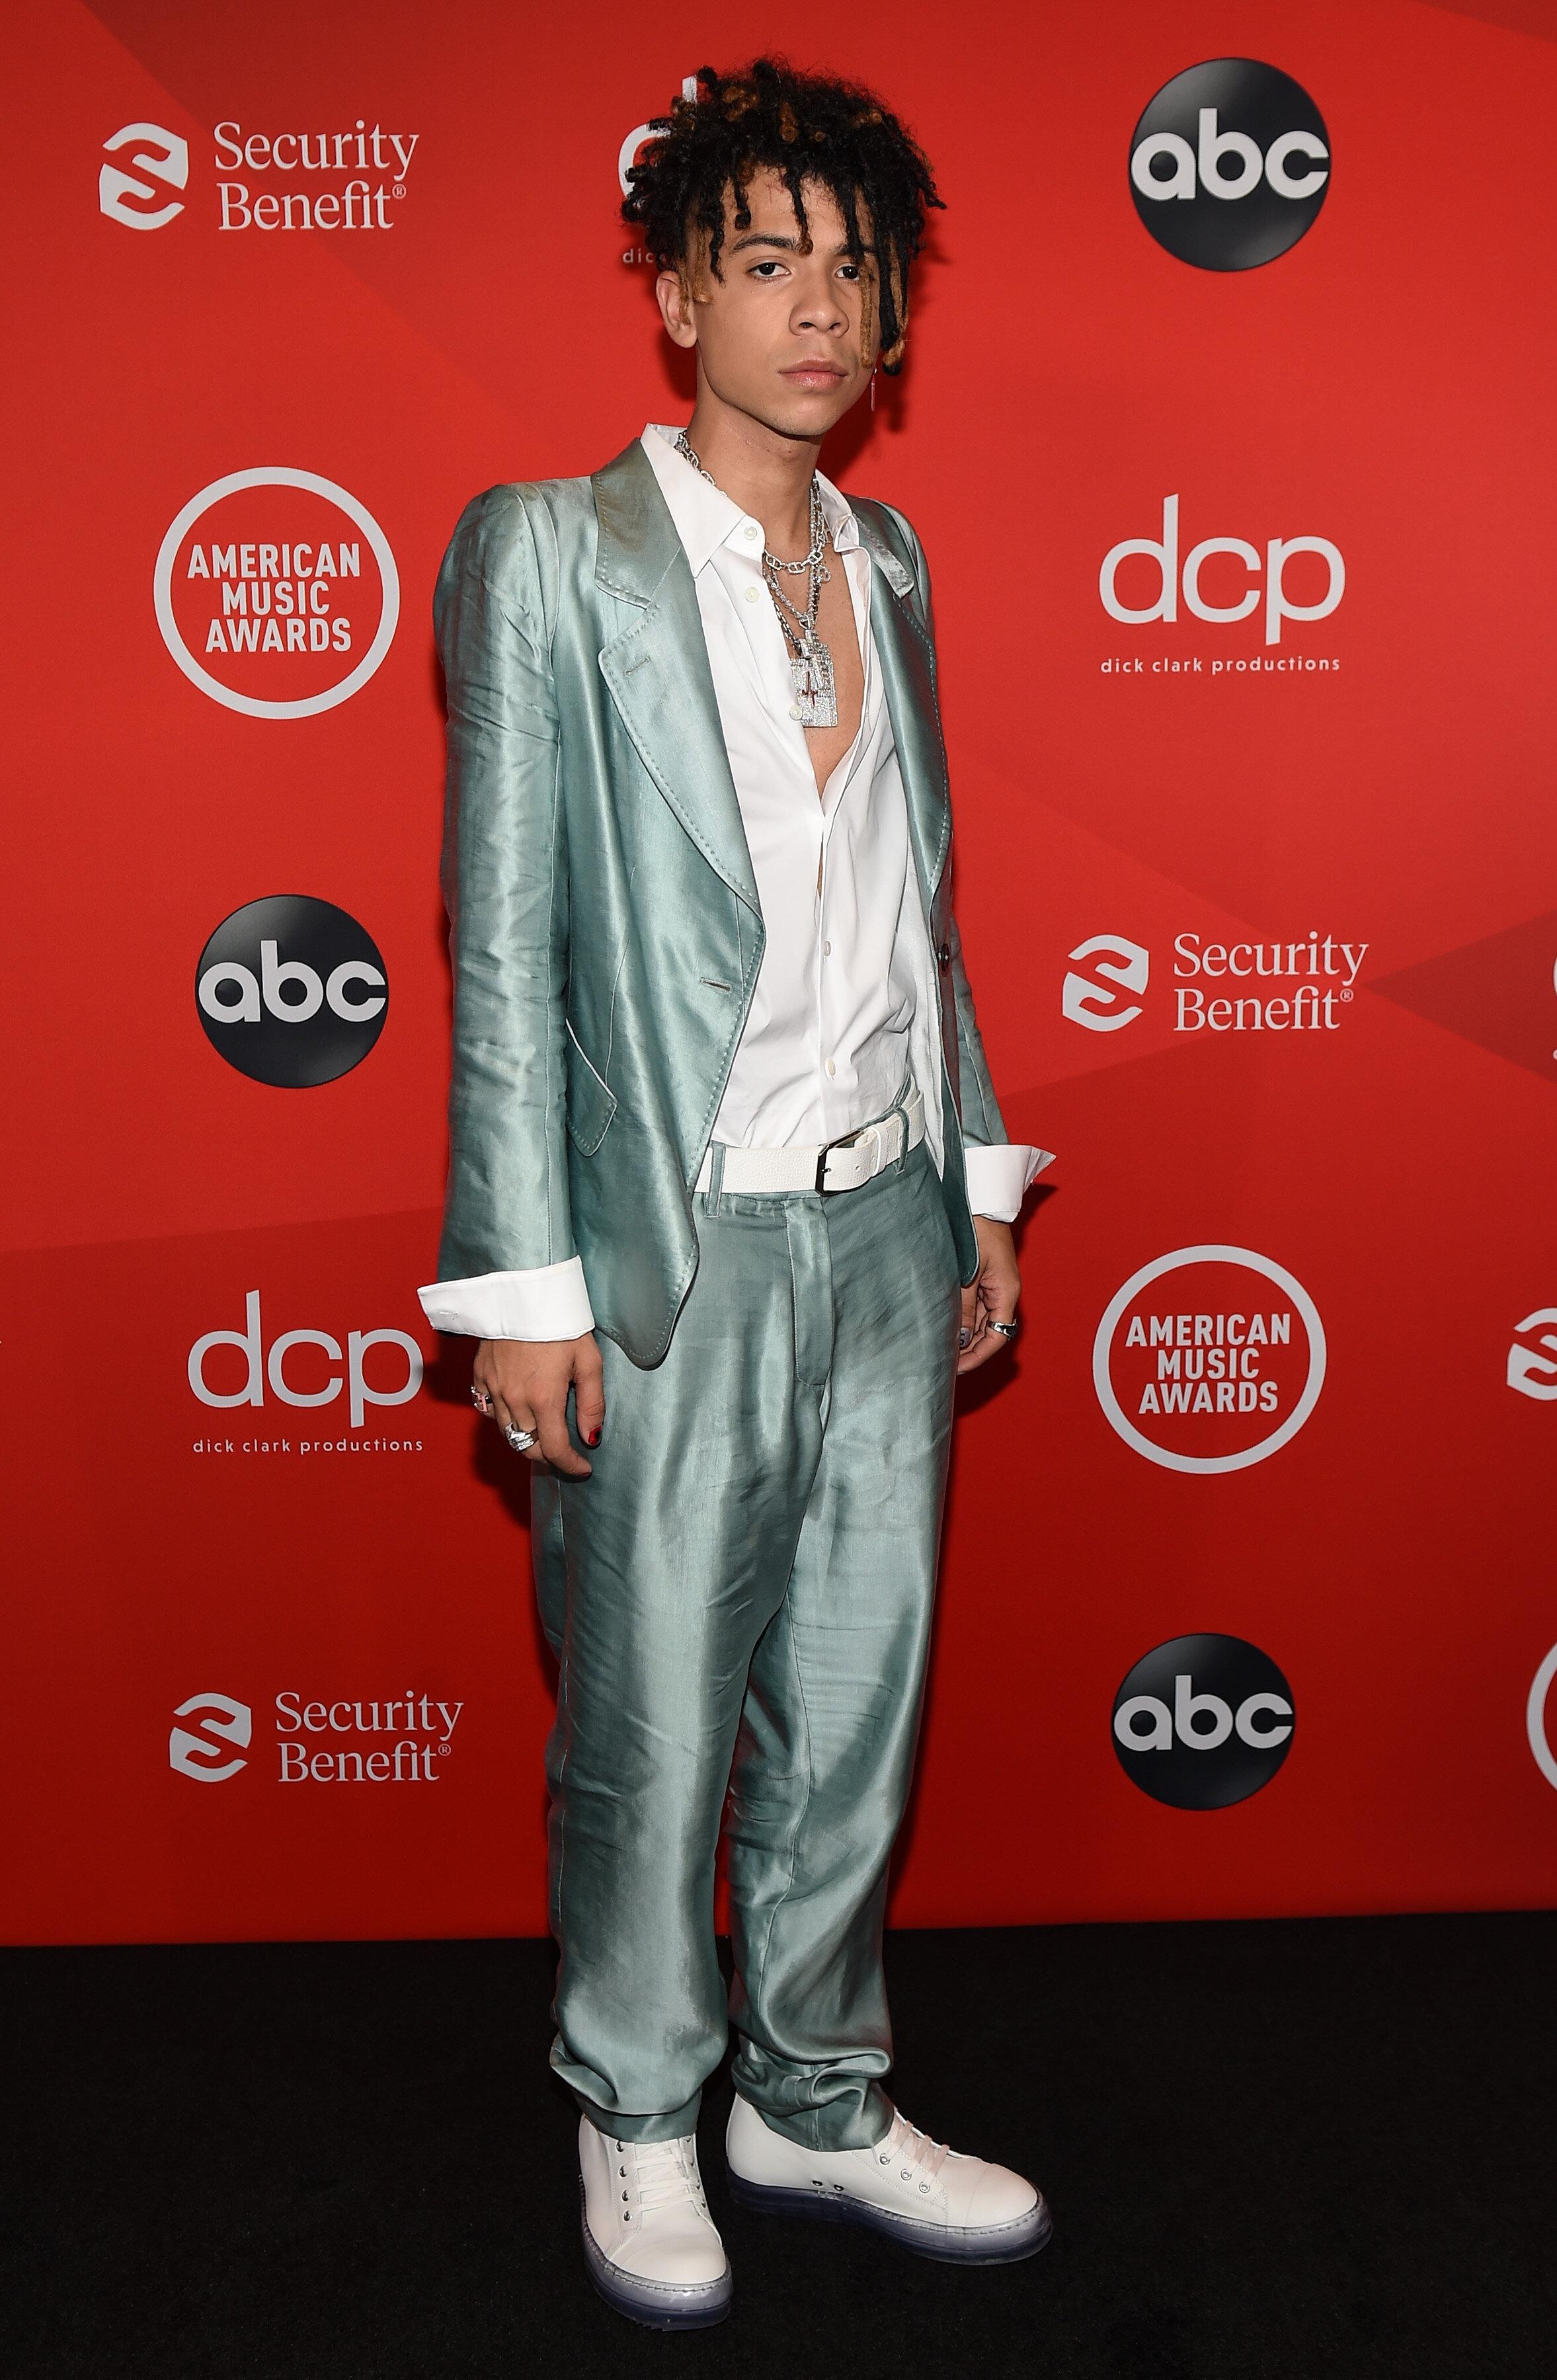 Iann Dior at the 2020 American Music Awards.